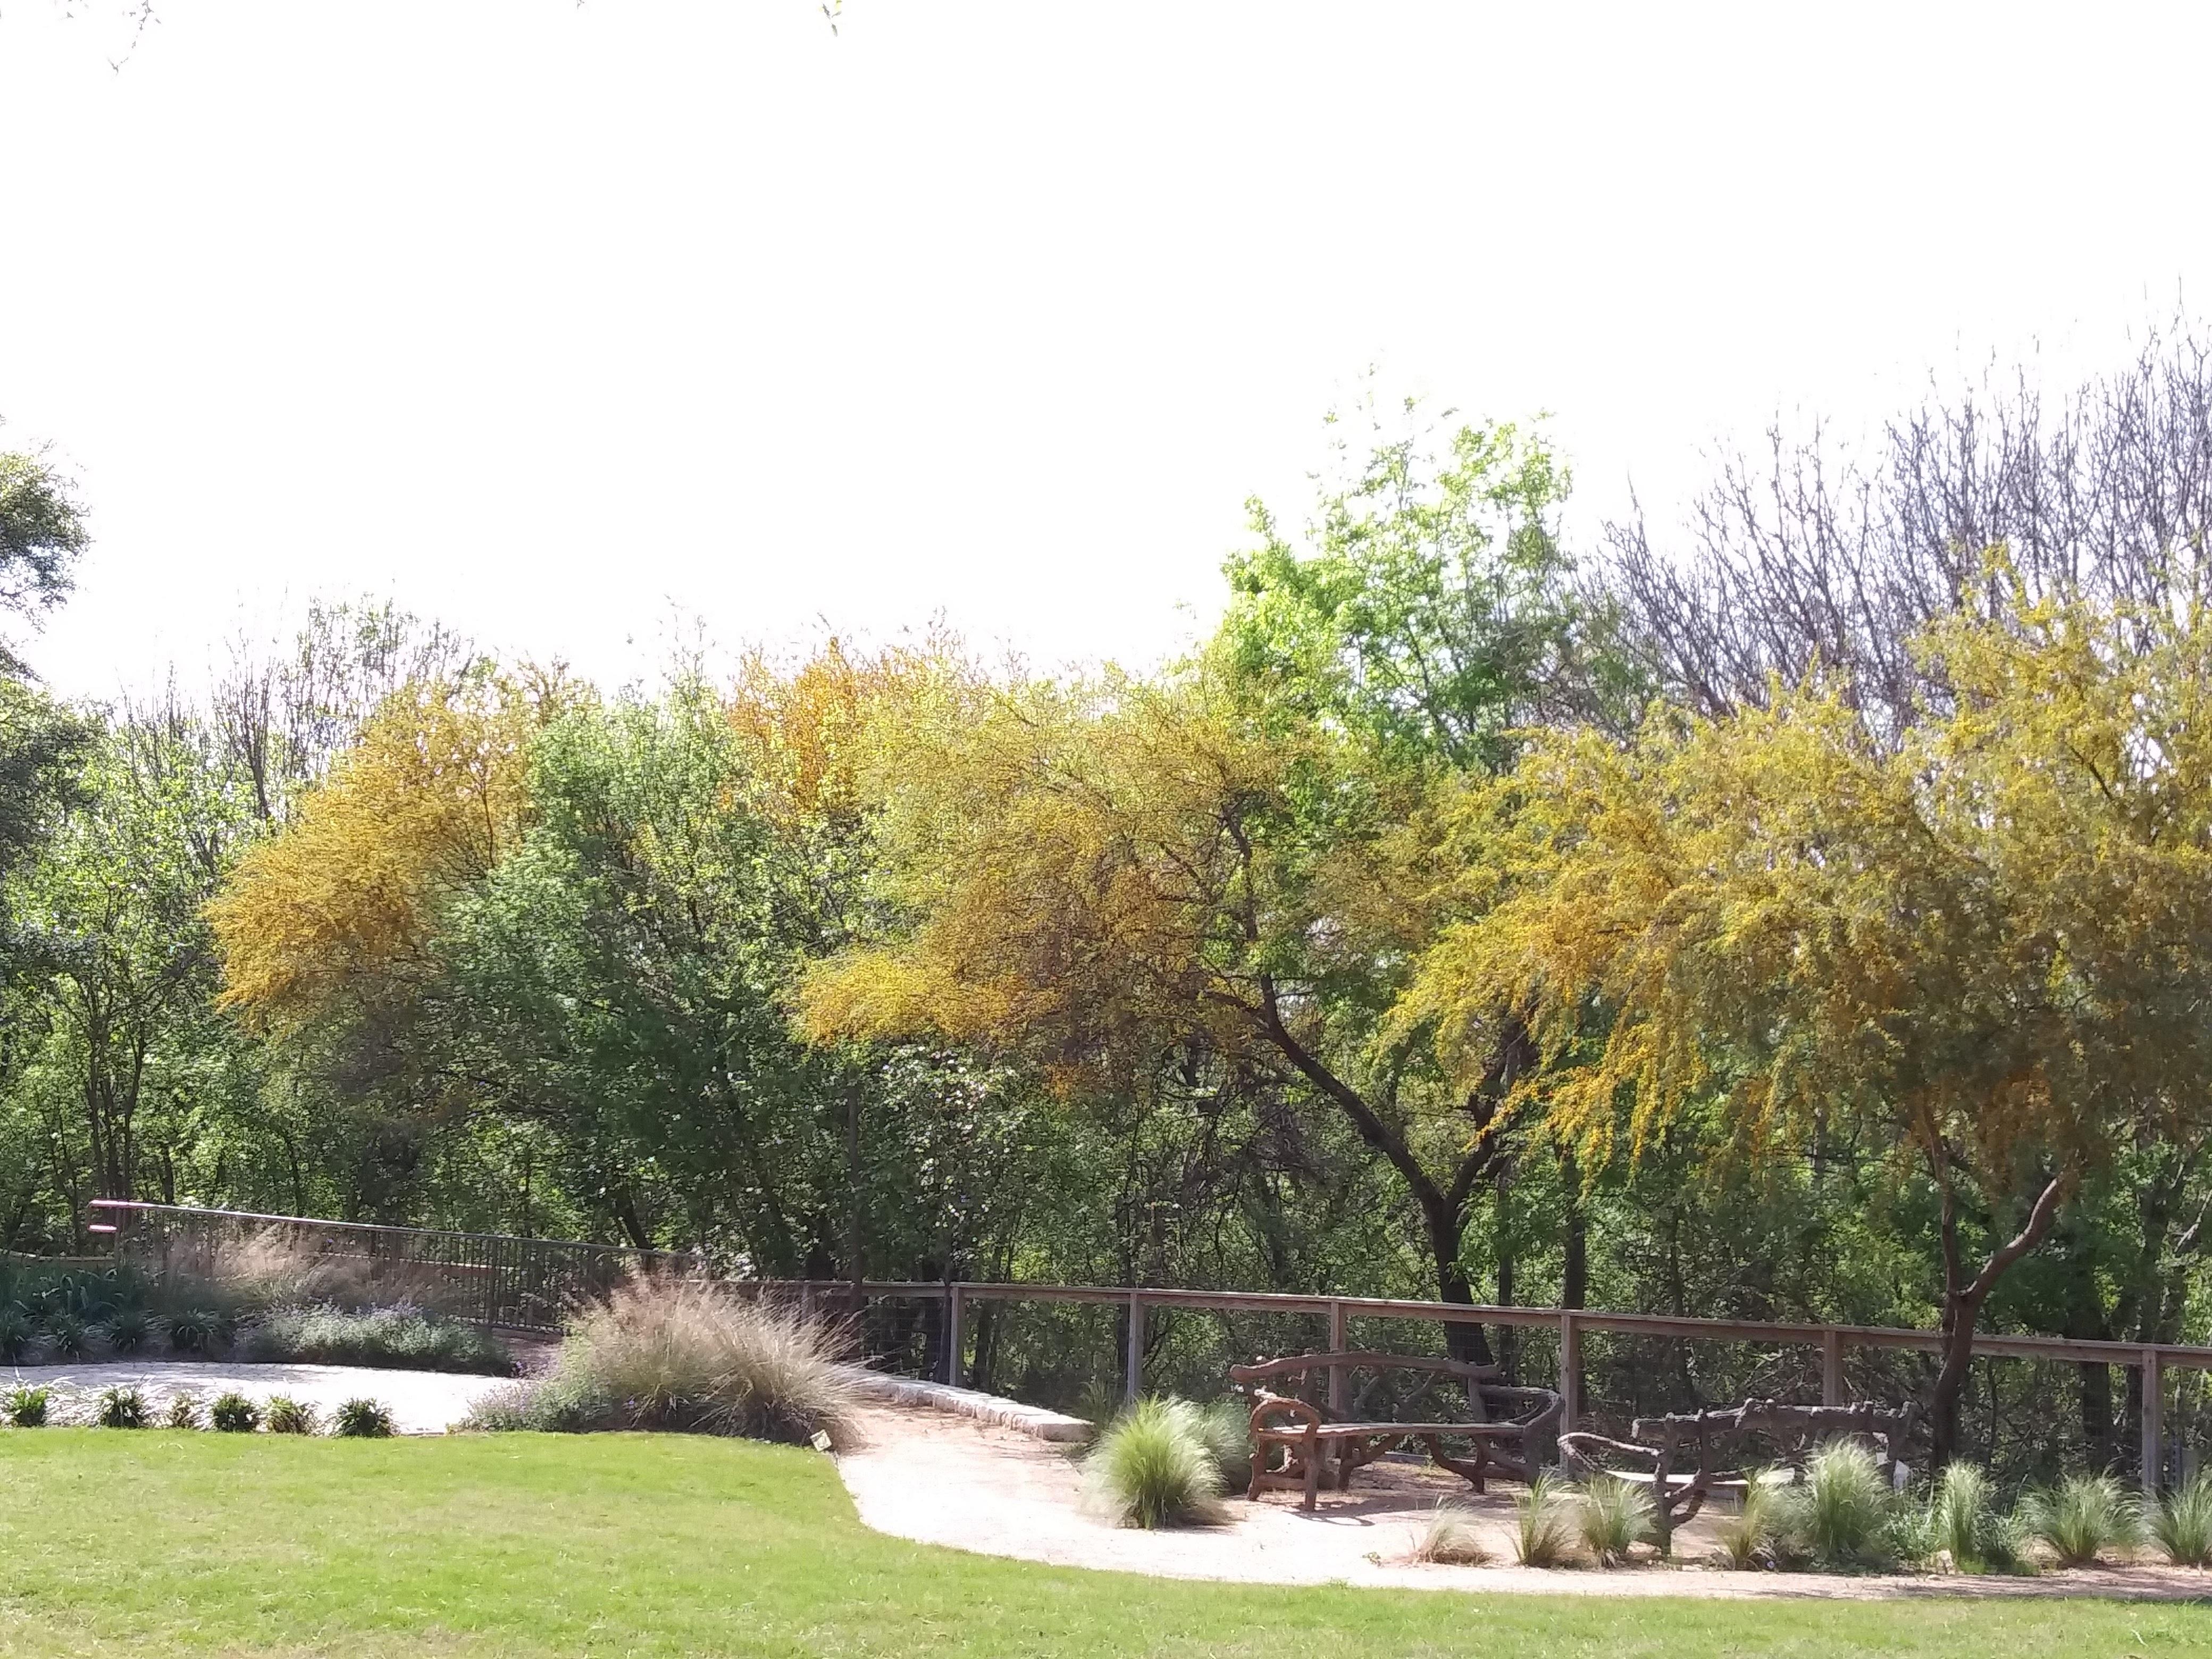 Huisache blooming at Ecumenical Center of San Antonio, Texas